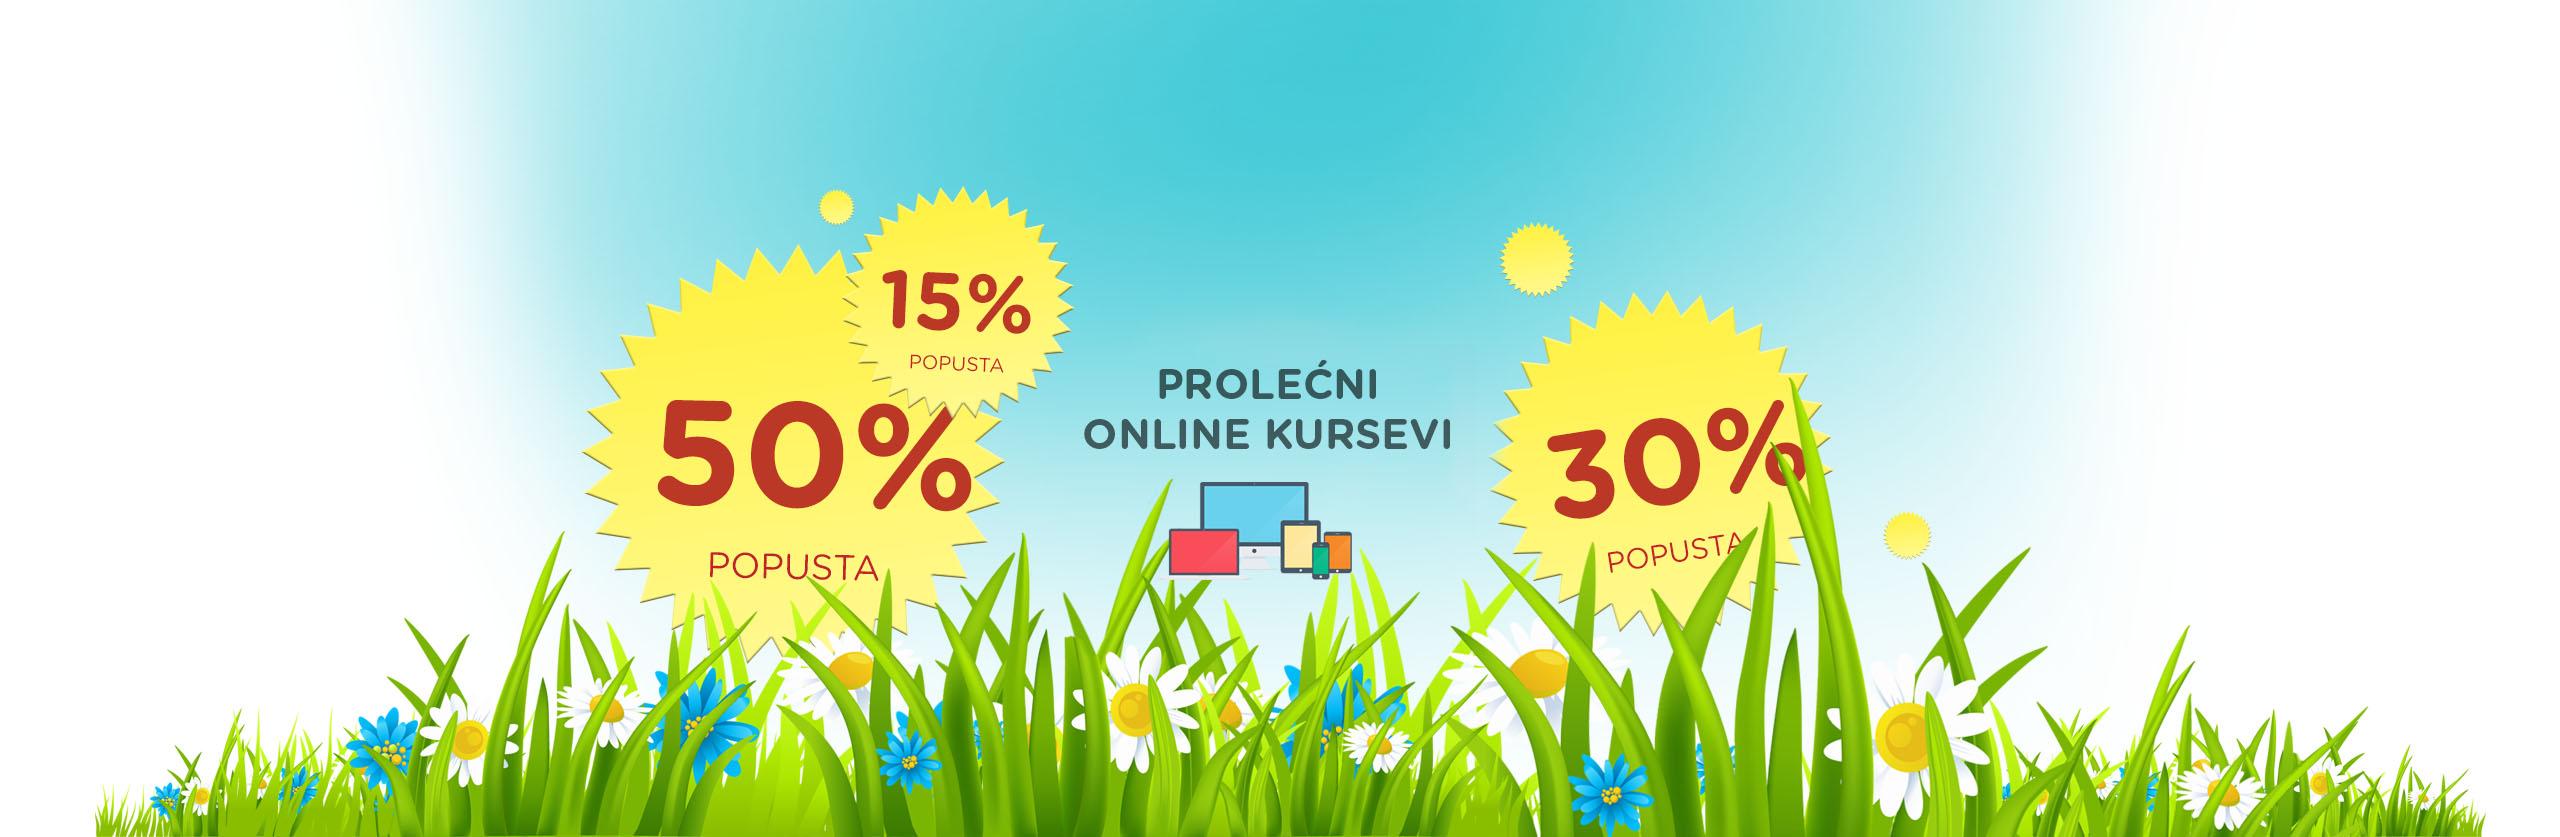 prolecni_upis_online_landing